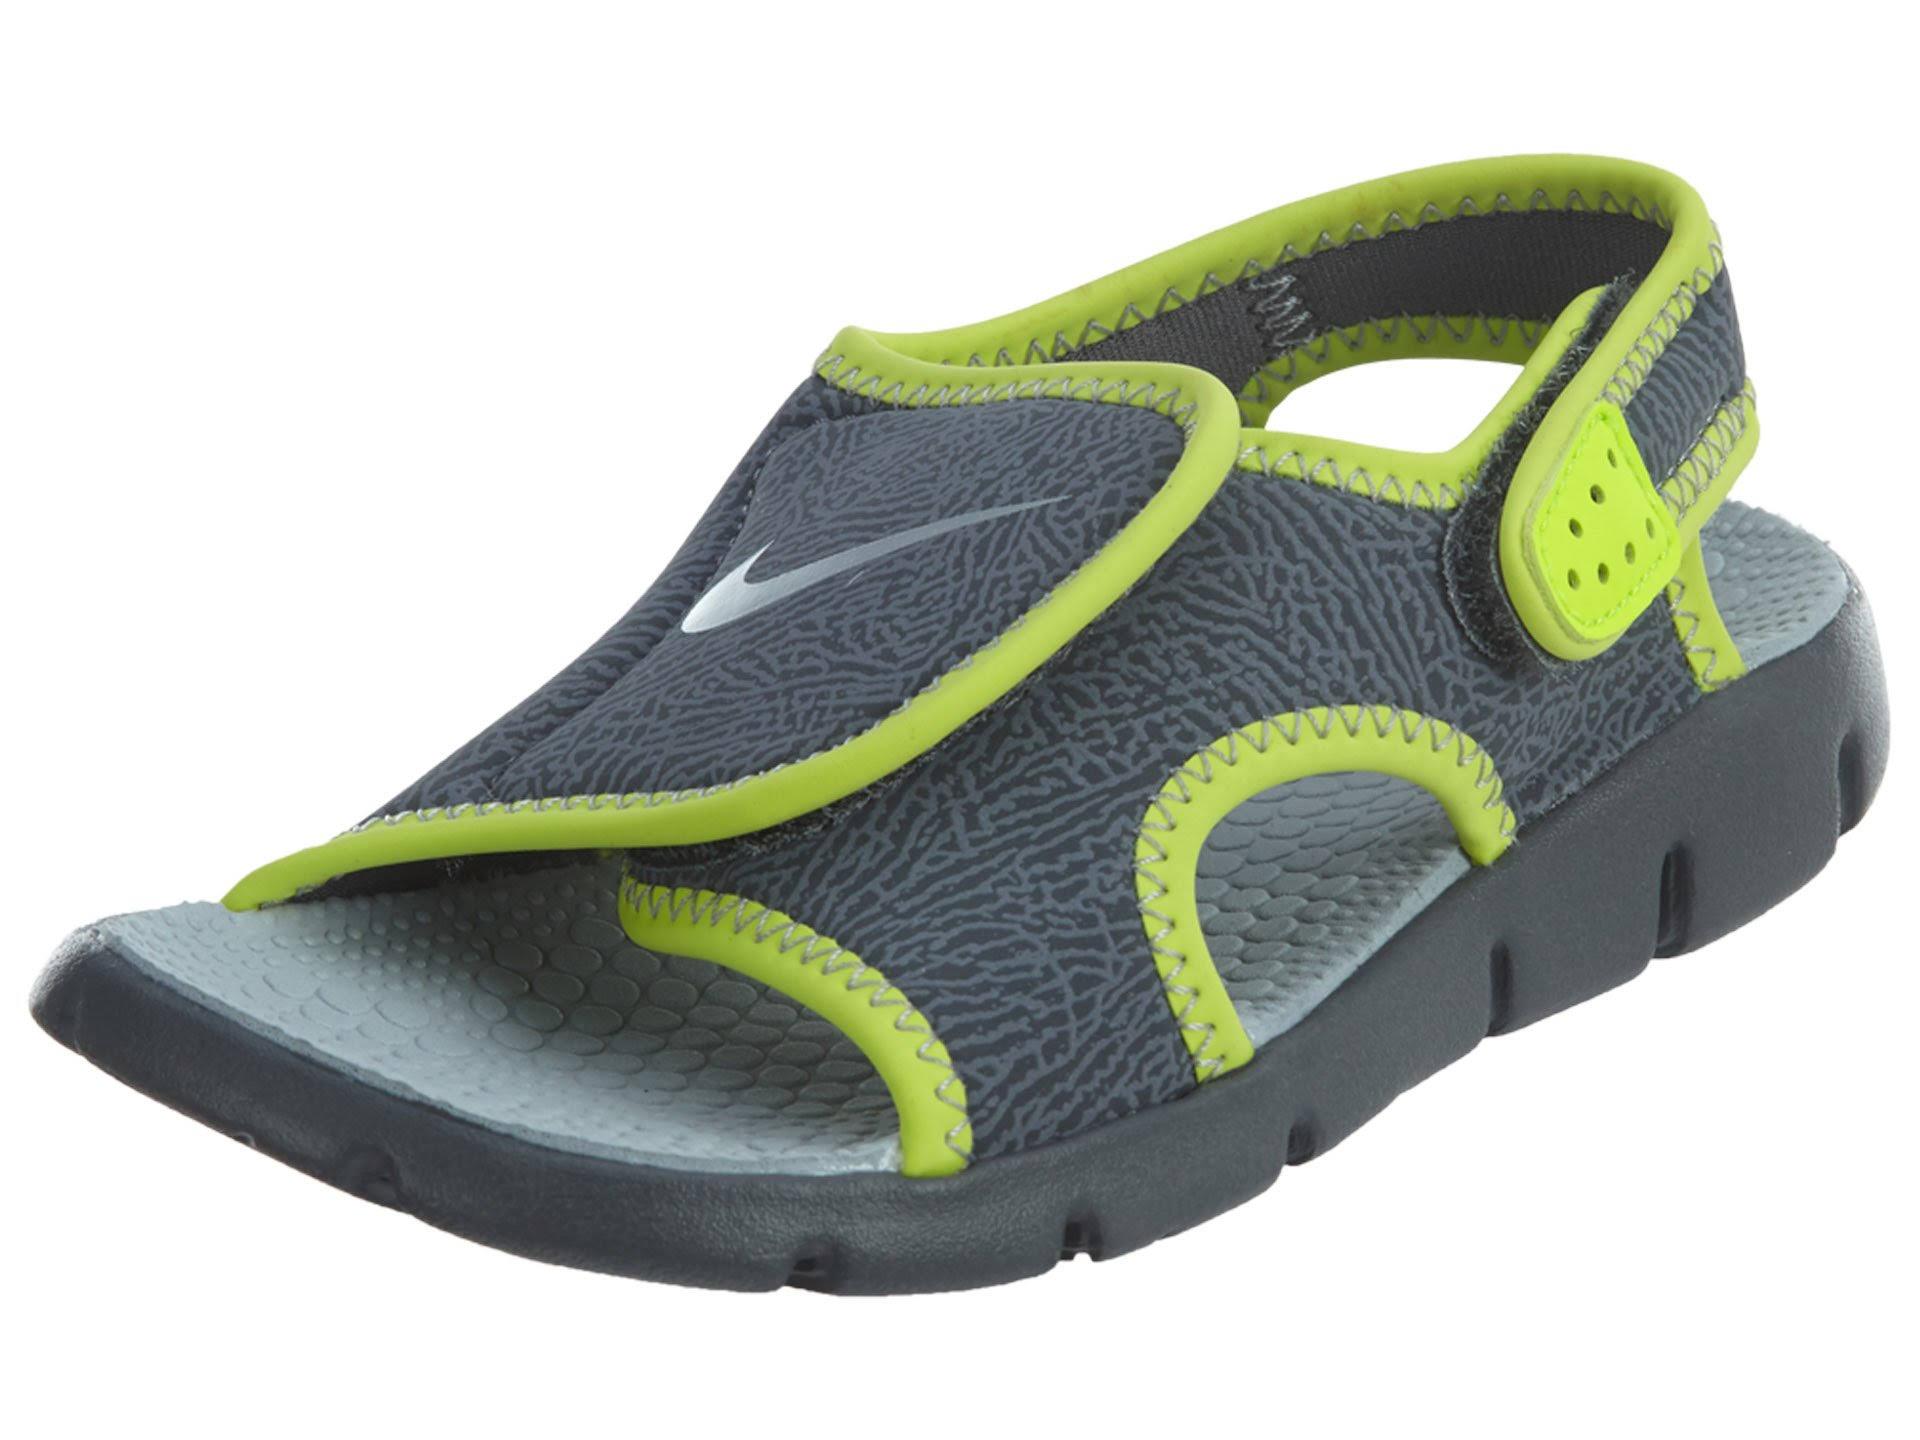 Nike Oscuro Sku Adjust Sunray Gris Kids Big 4 386518 voltio Gris Lobo xBr14wx